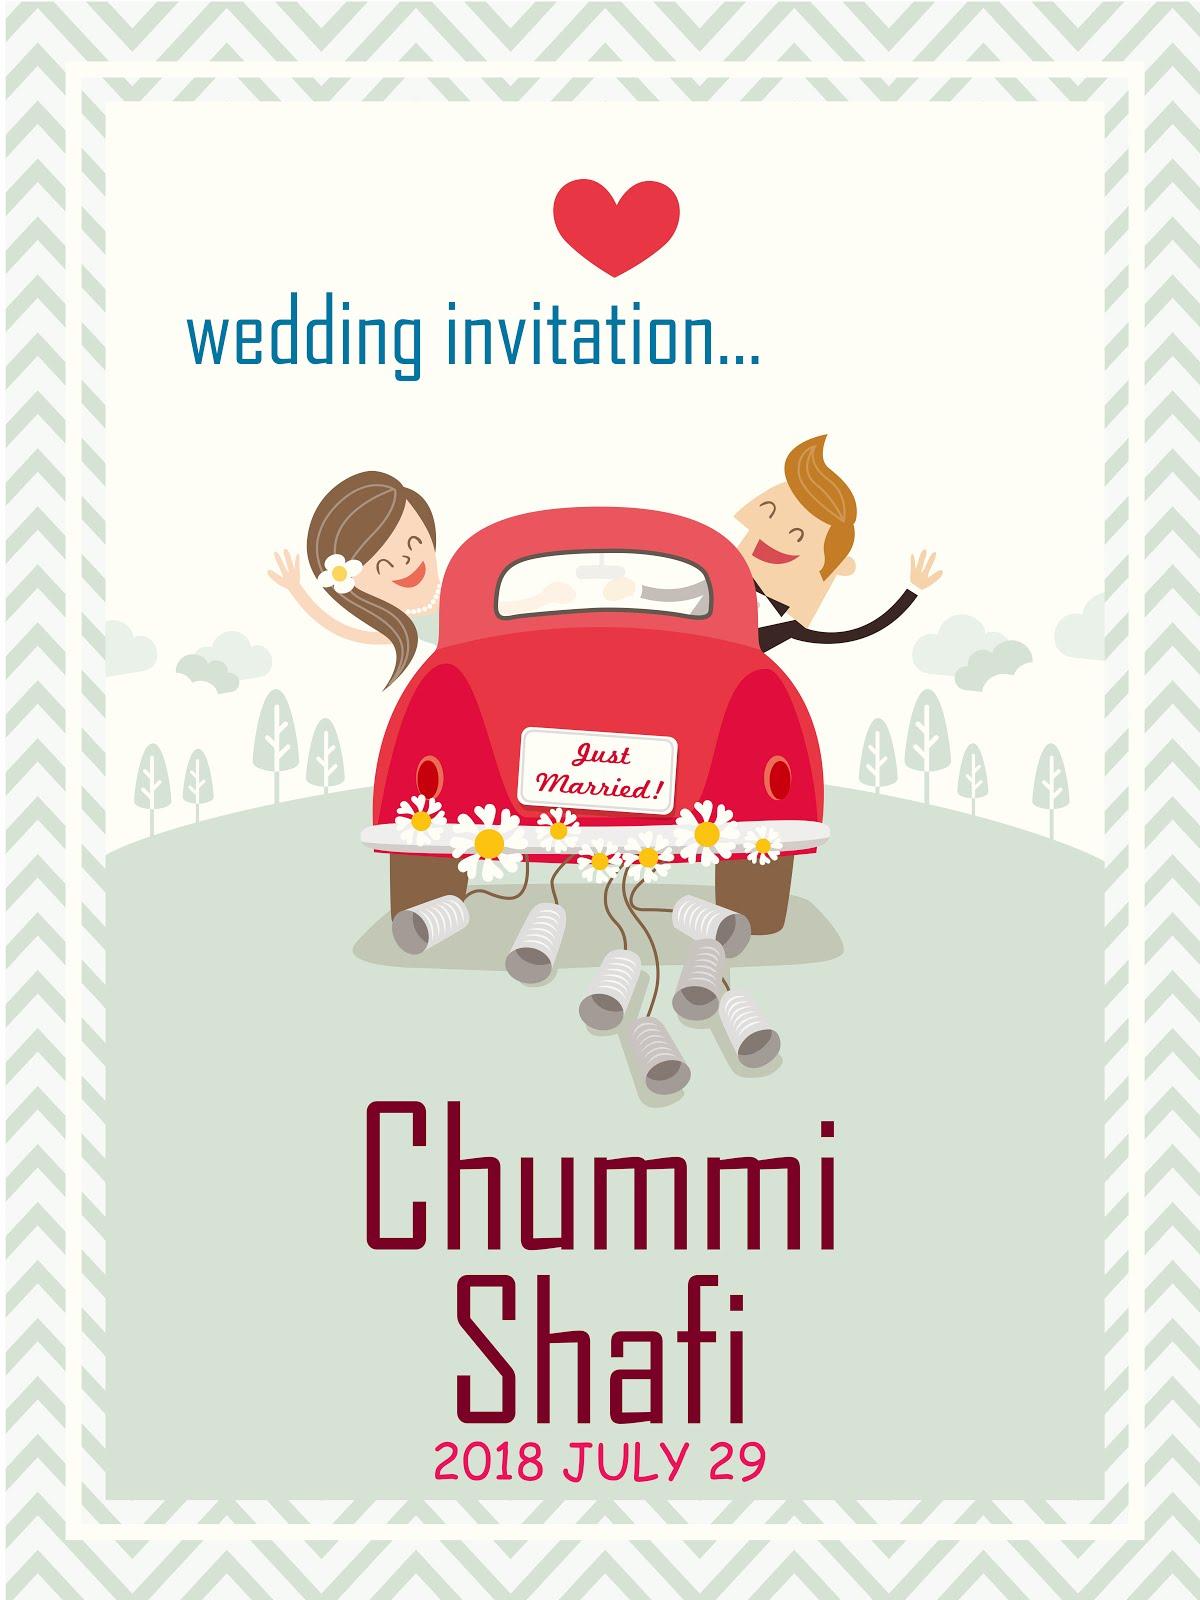 WEDDING INVITATION - Asru Design